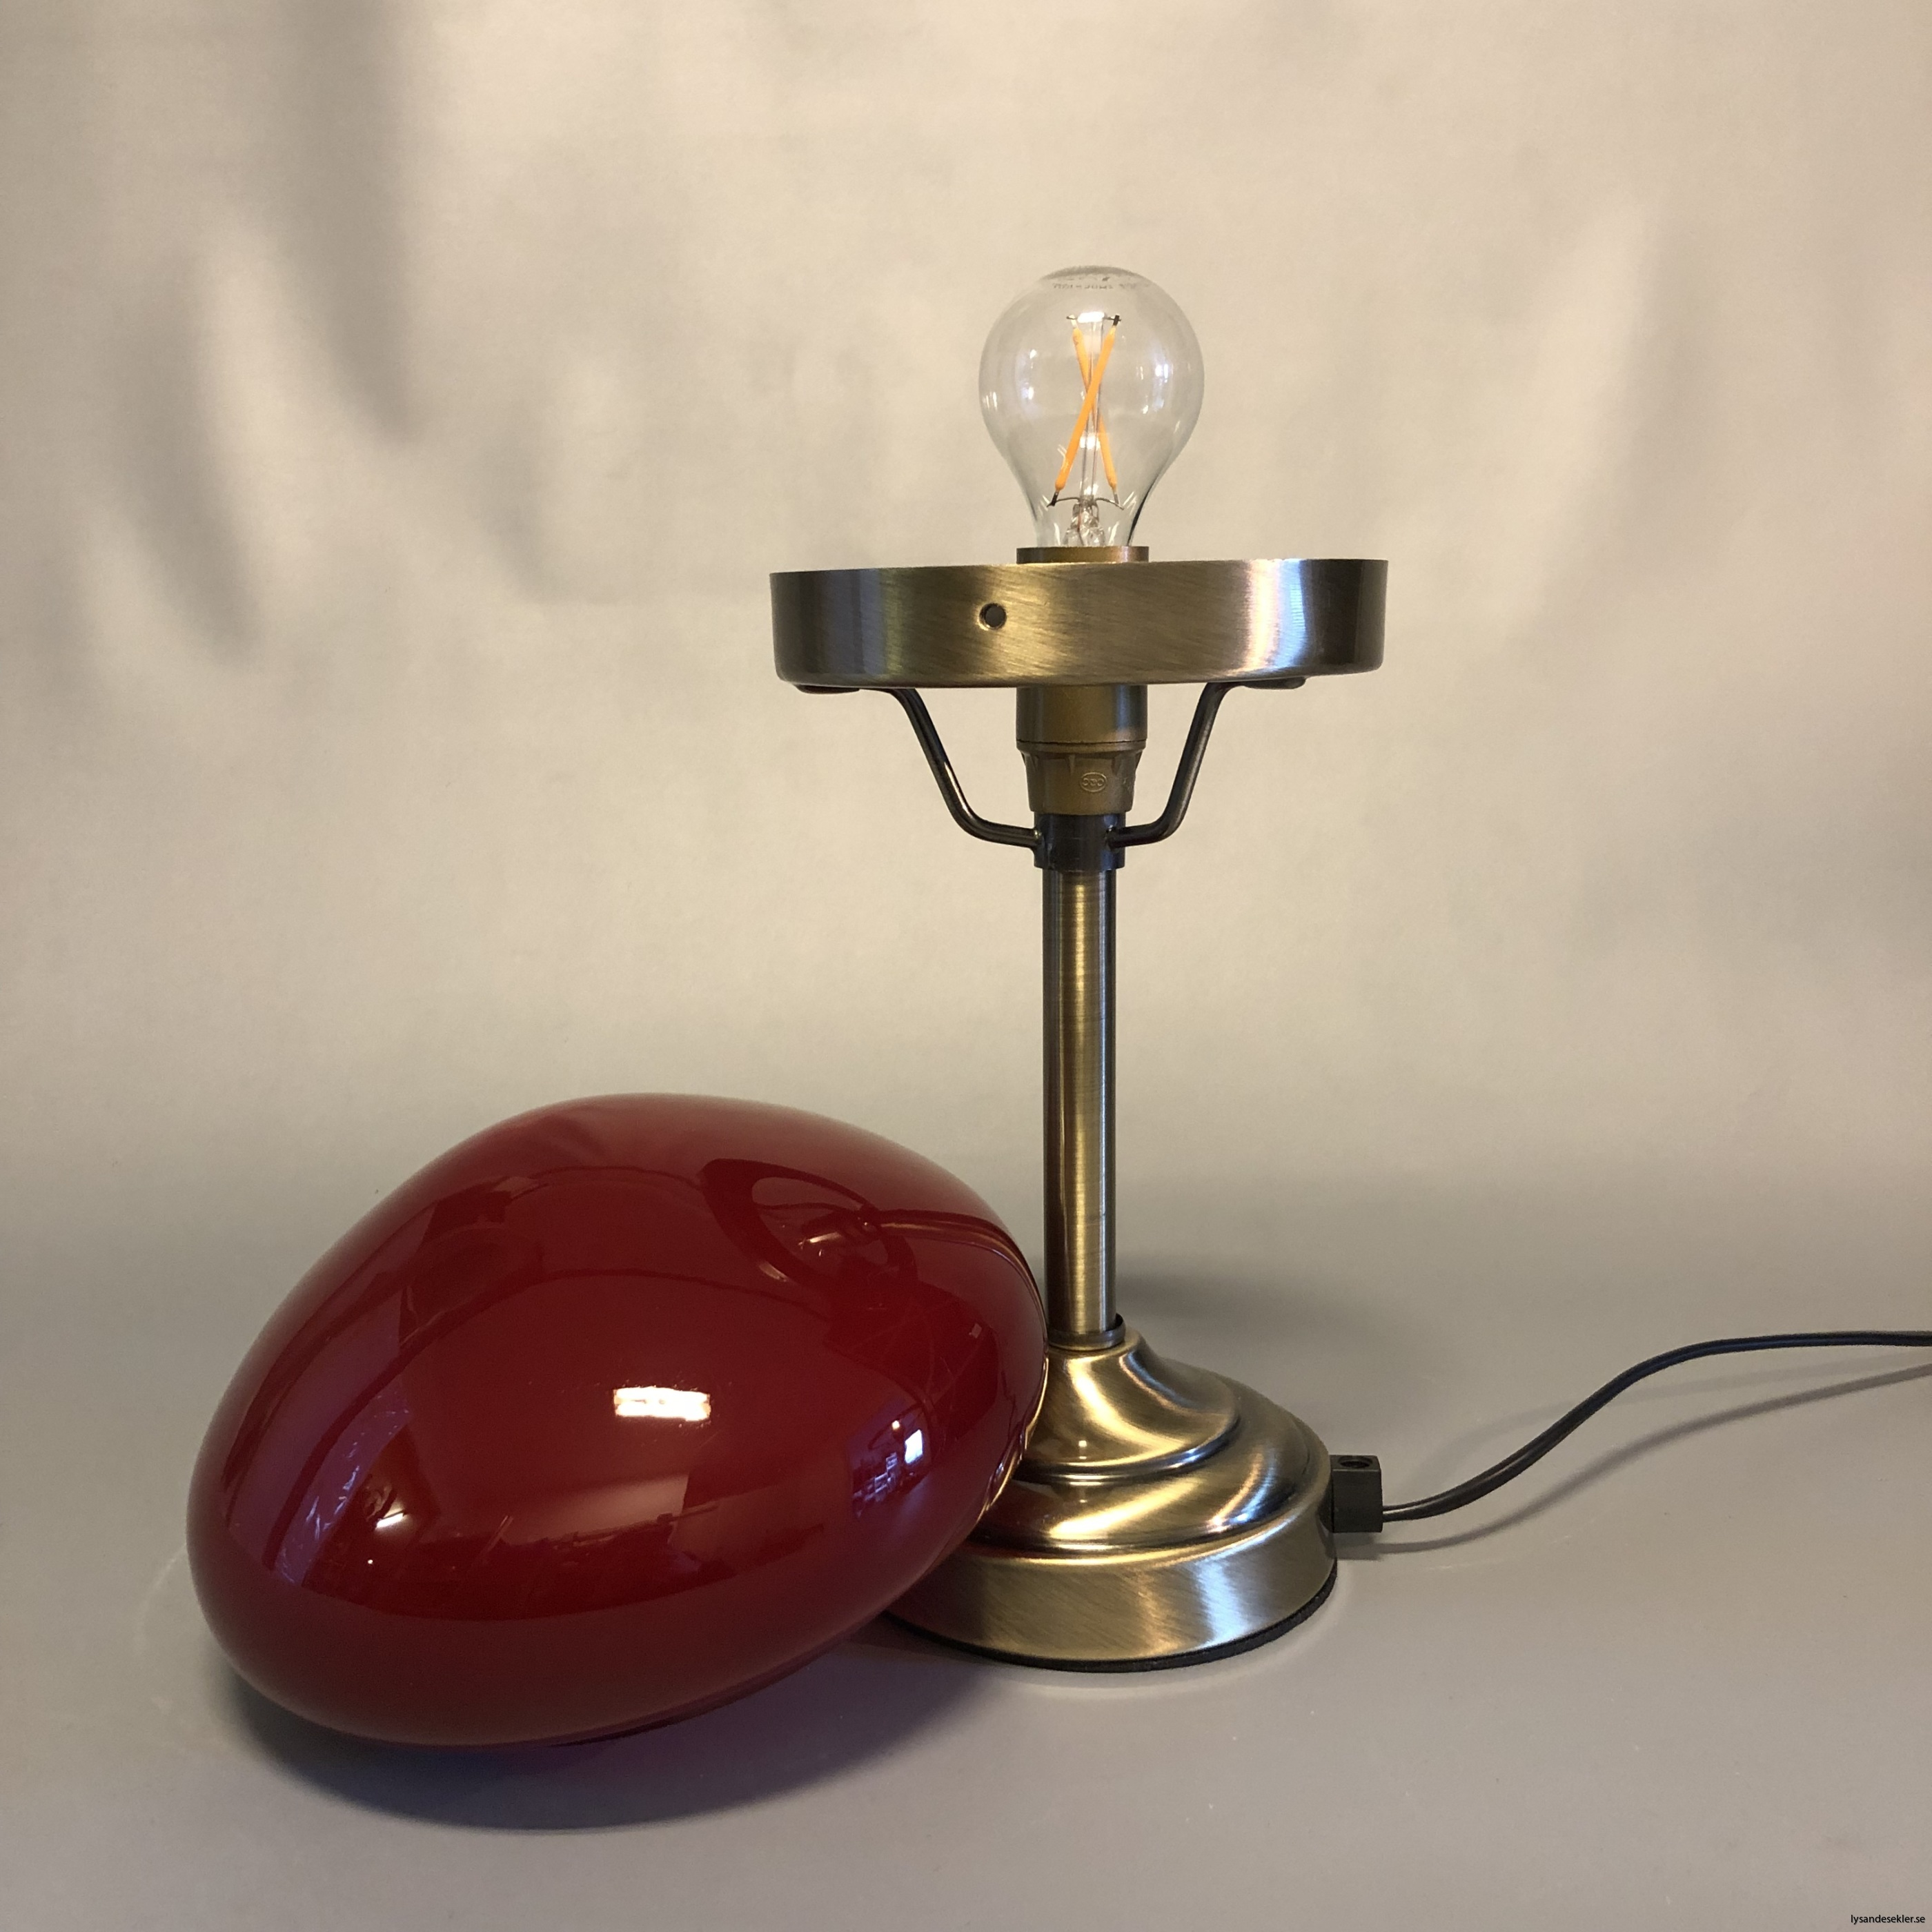 liten strindbergslampa 12 cm skärm9